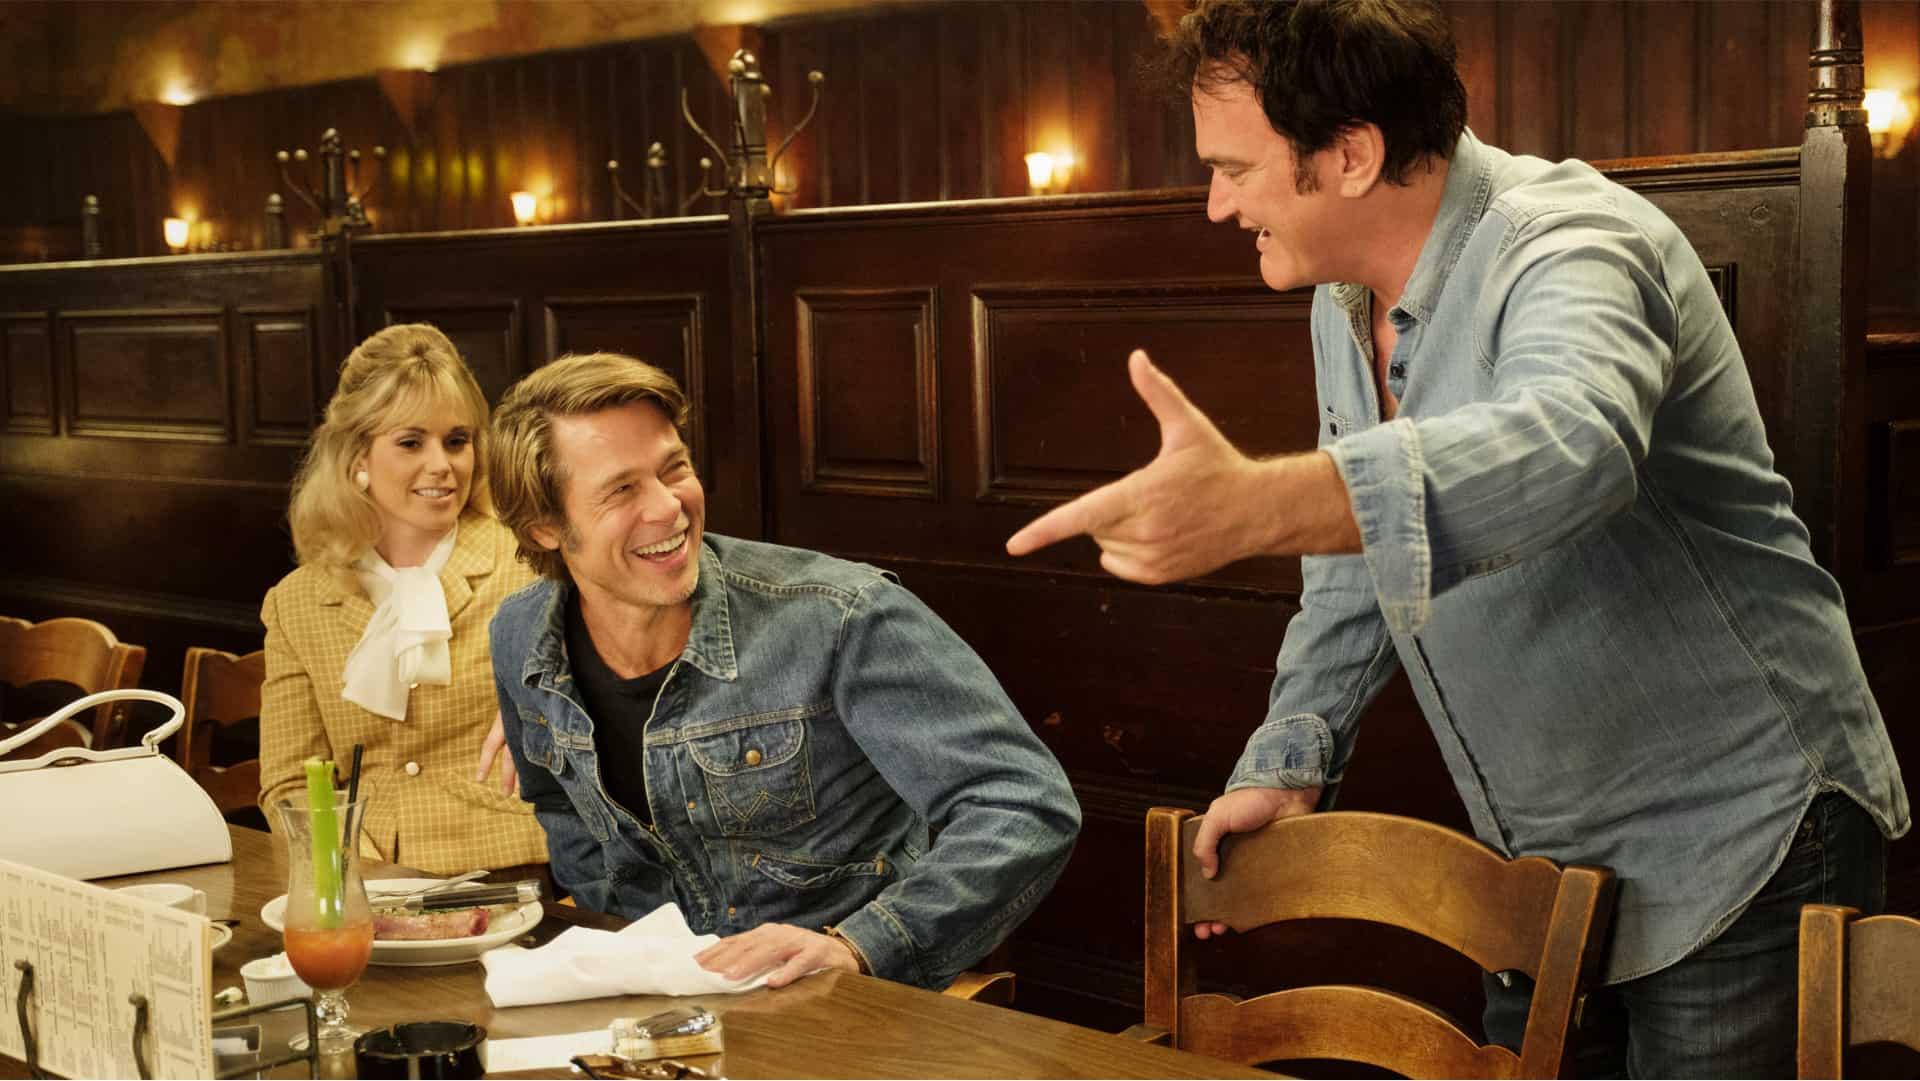 Quentin-Tarantino-Movies-Interviews-and-Quotes-Header-StudioBinder.jpg